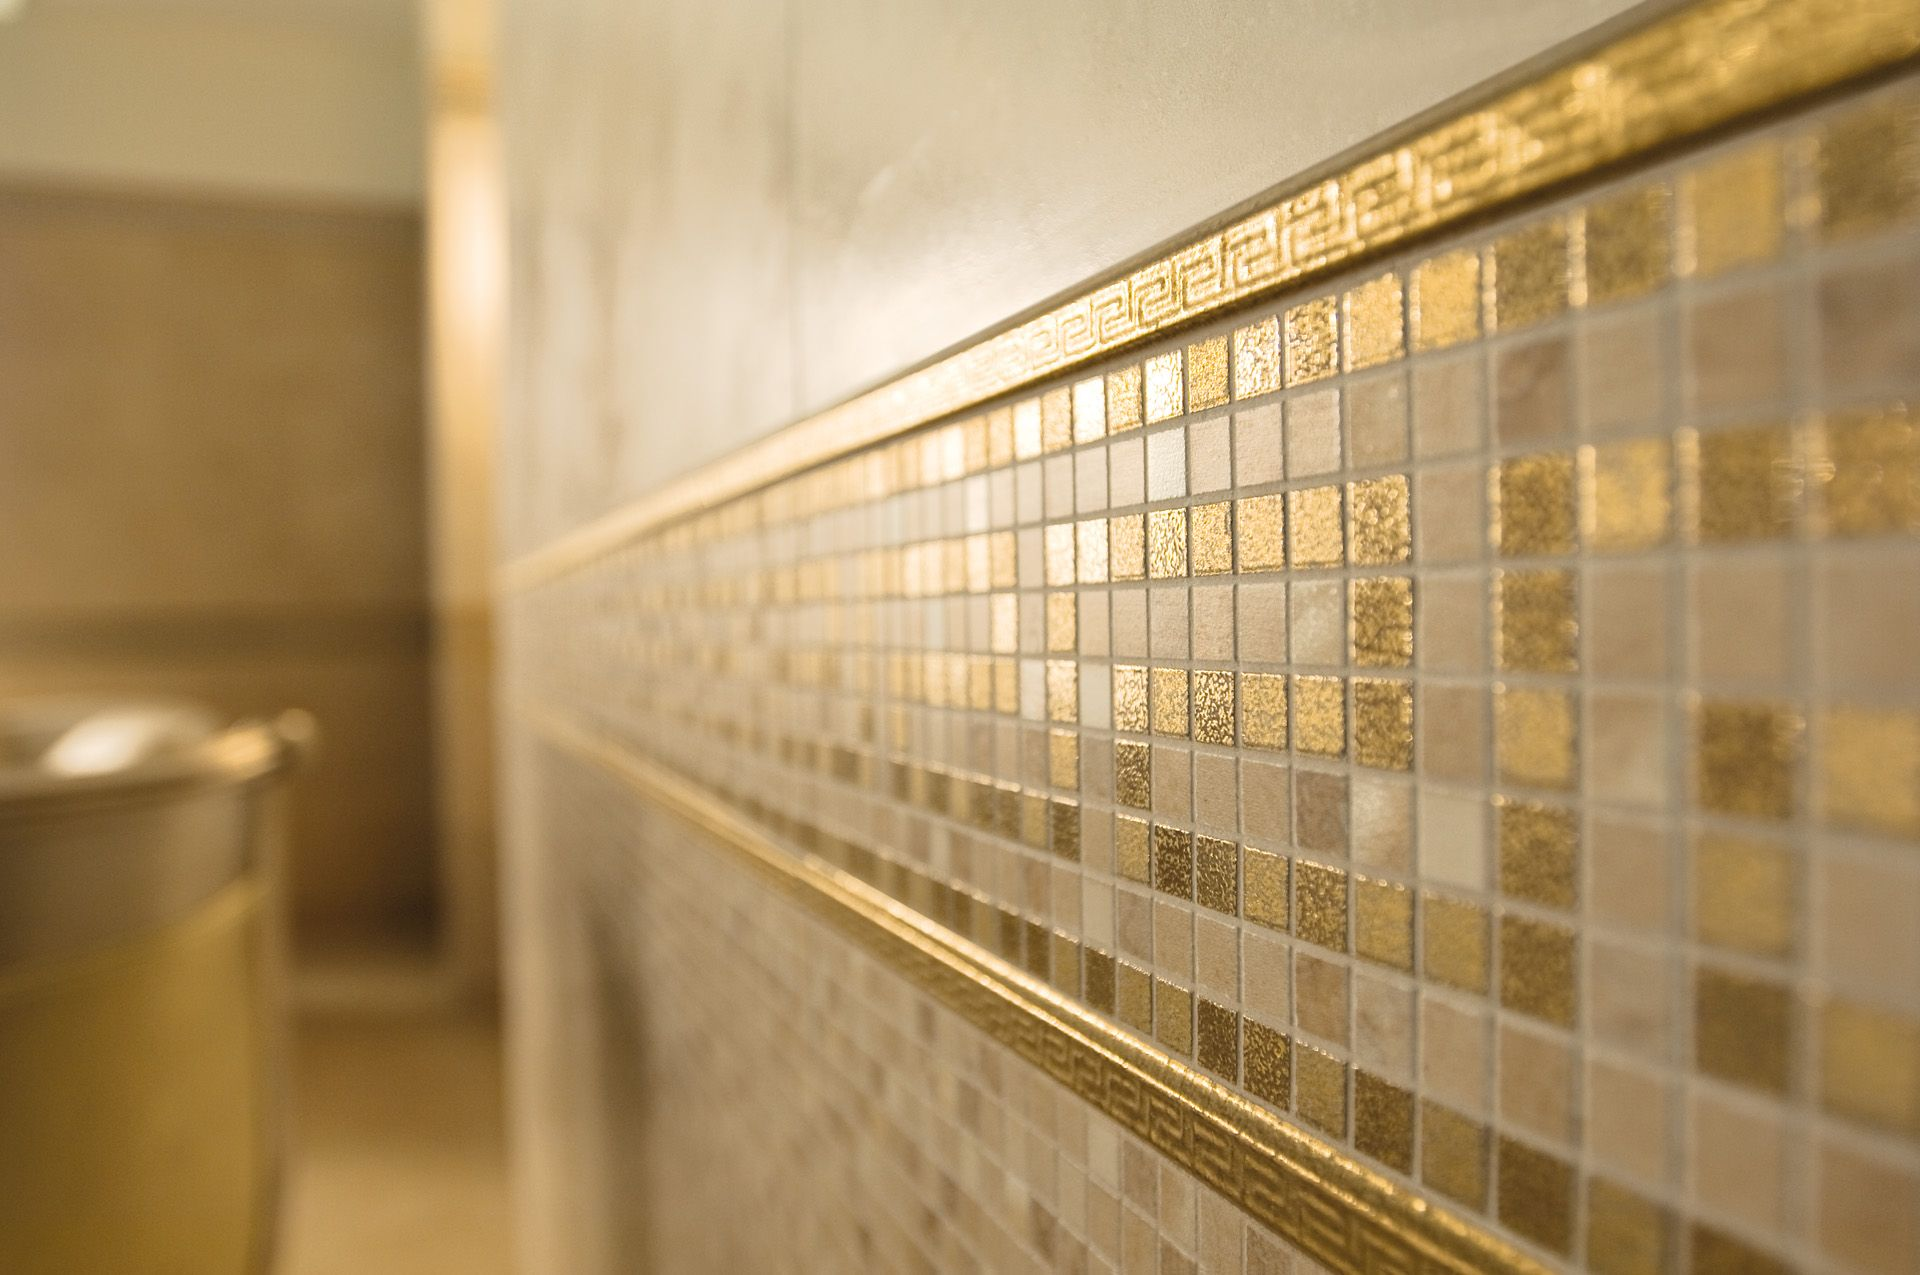 Or Gold Carrelage Vanitas19 Versace Carrelage Carrelage Antiderapant Salle De Bain Contemporaine